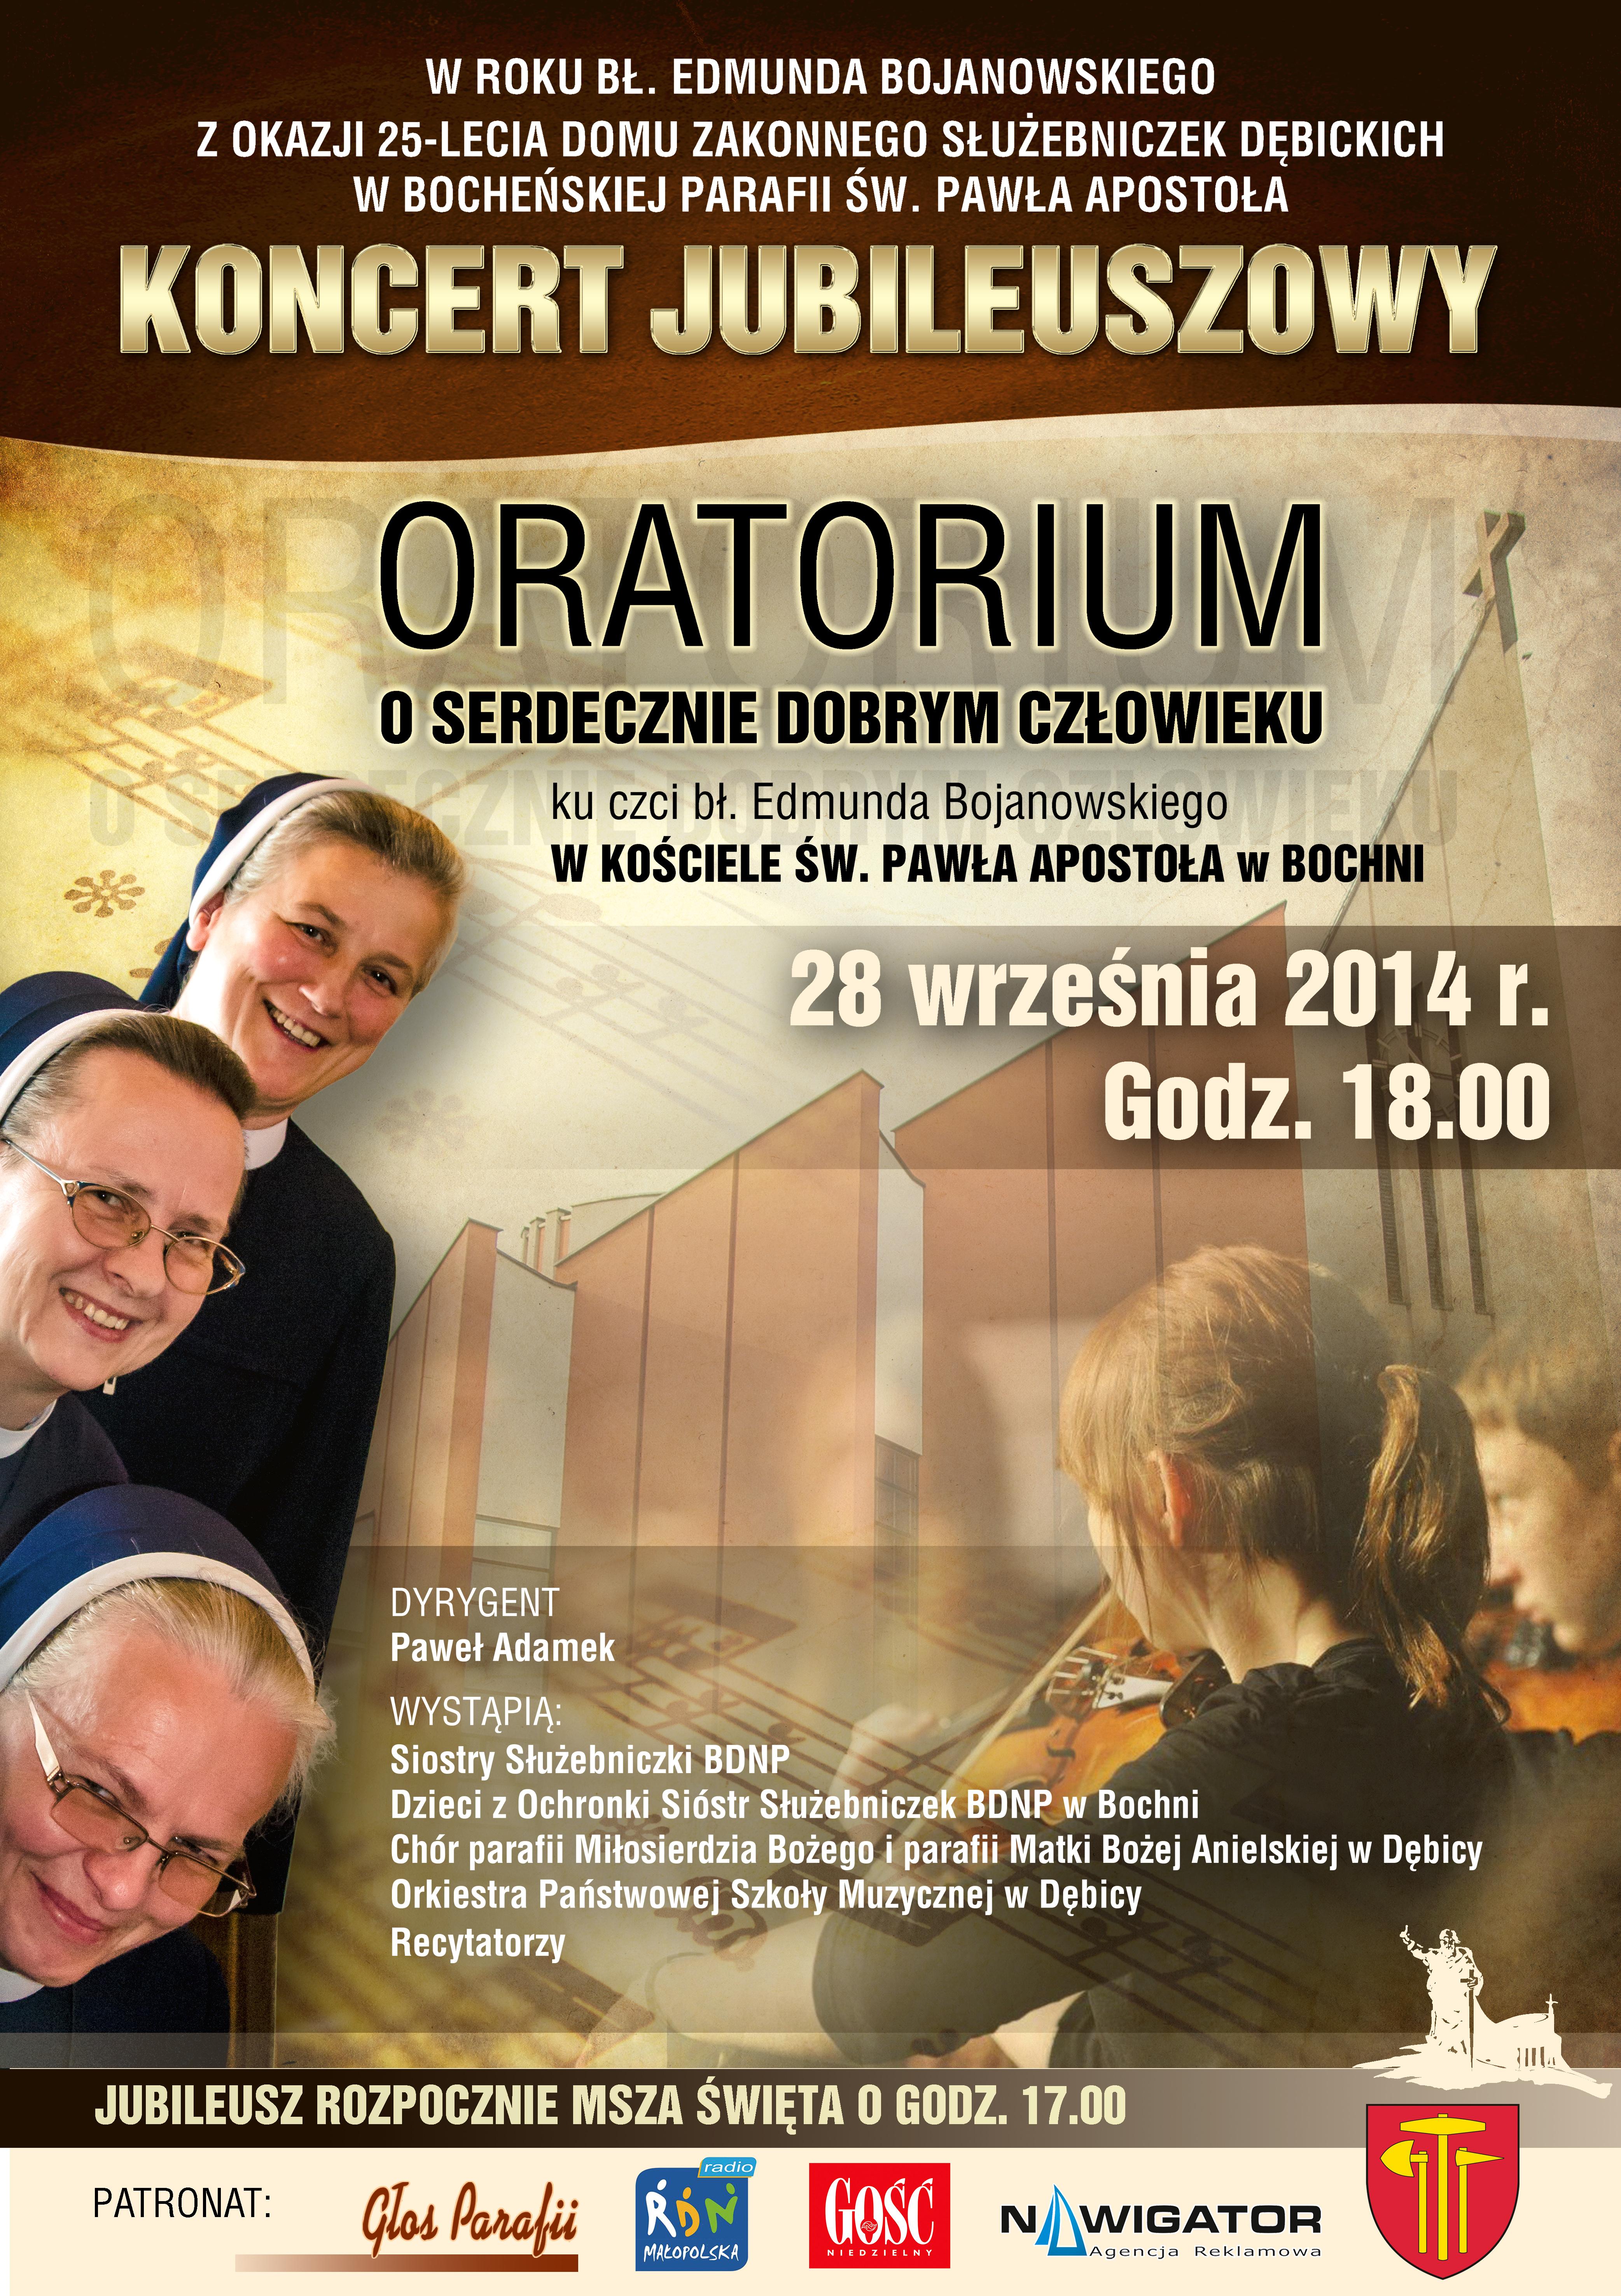 2014-09-28_oratorium-bojanowski_bochnia_plakat